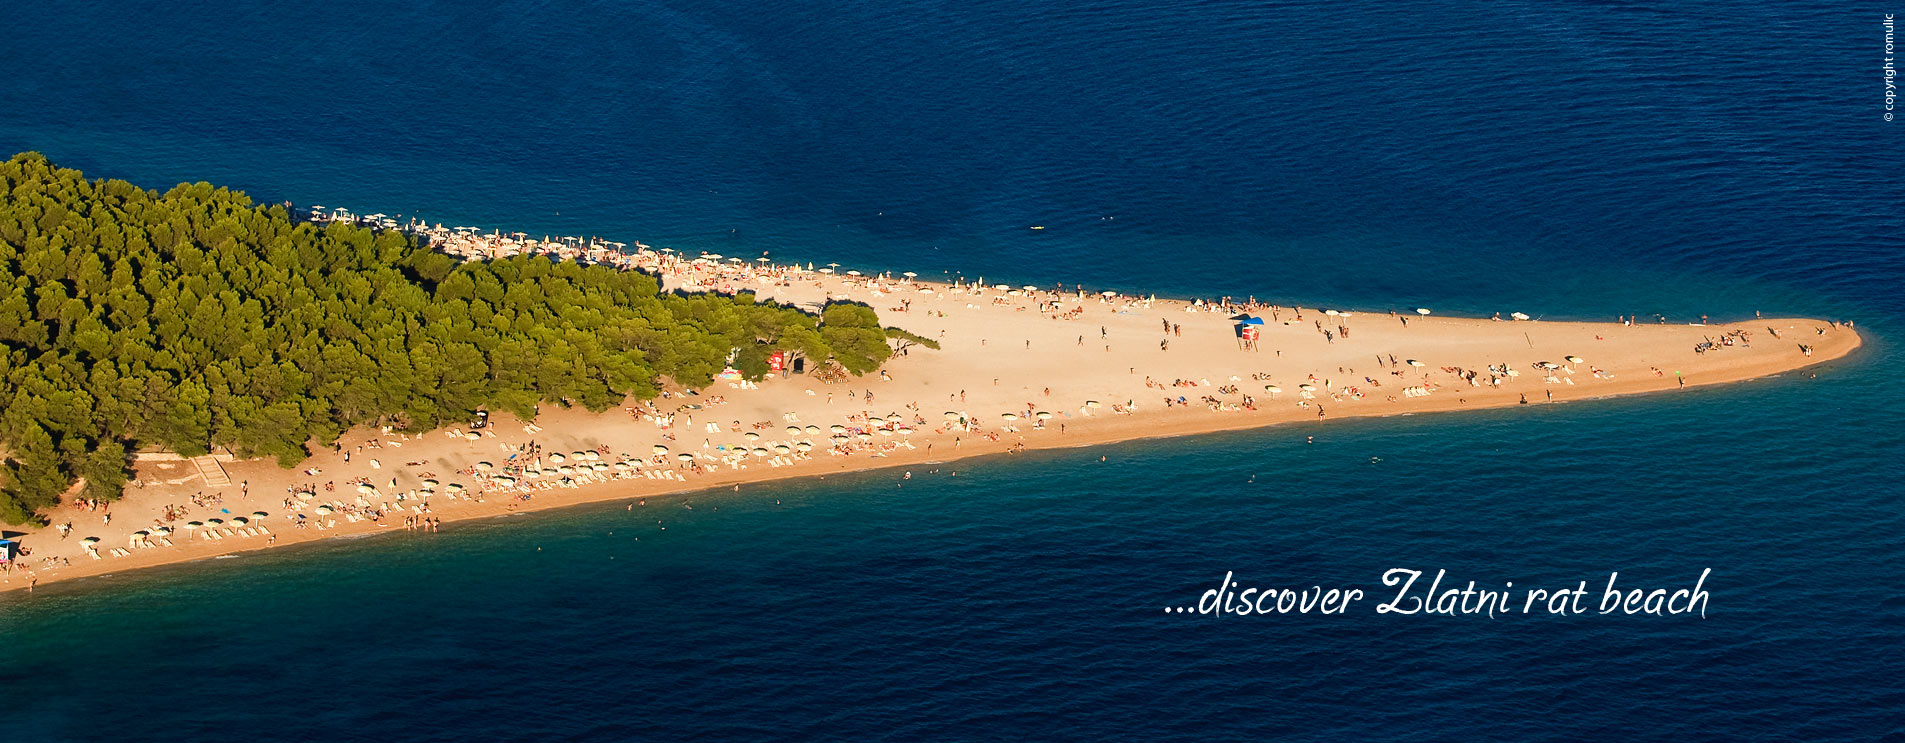 Zlatni rat is one of the most beautiful beaches in Croatia